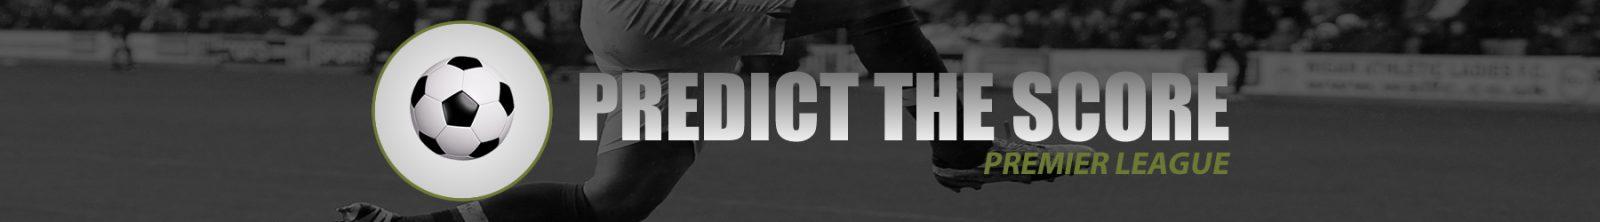 Predict The Score - Premier League